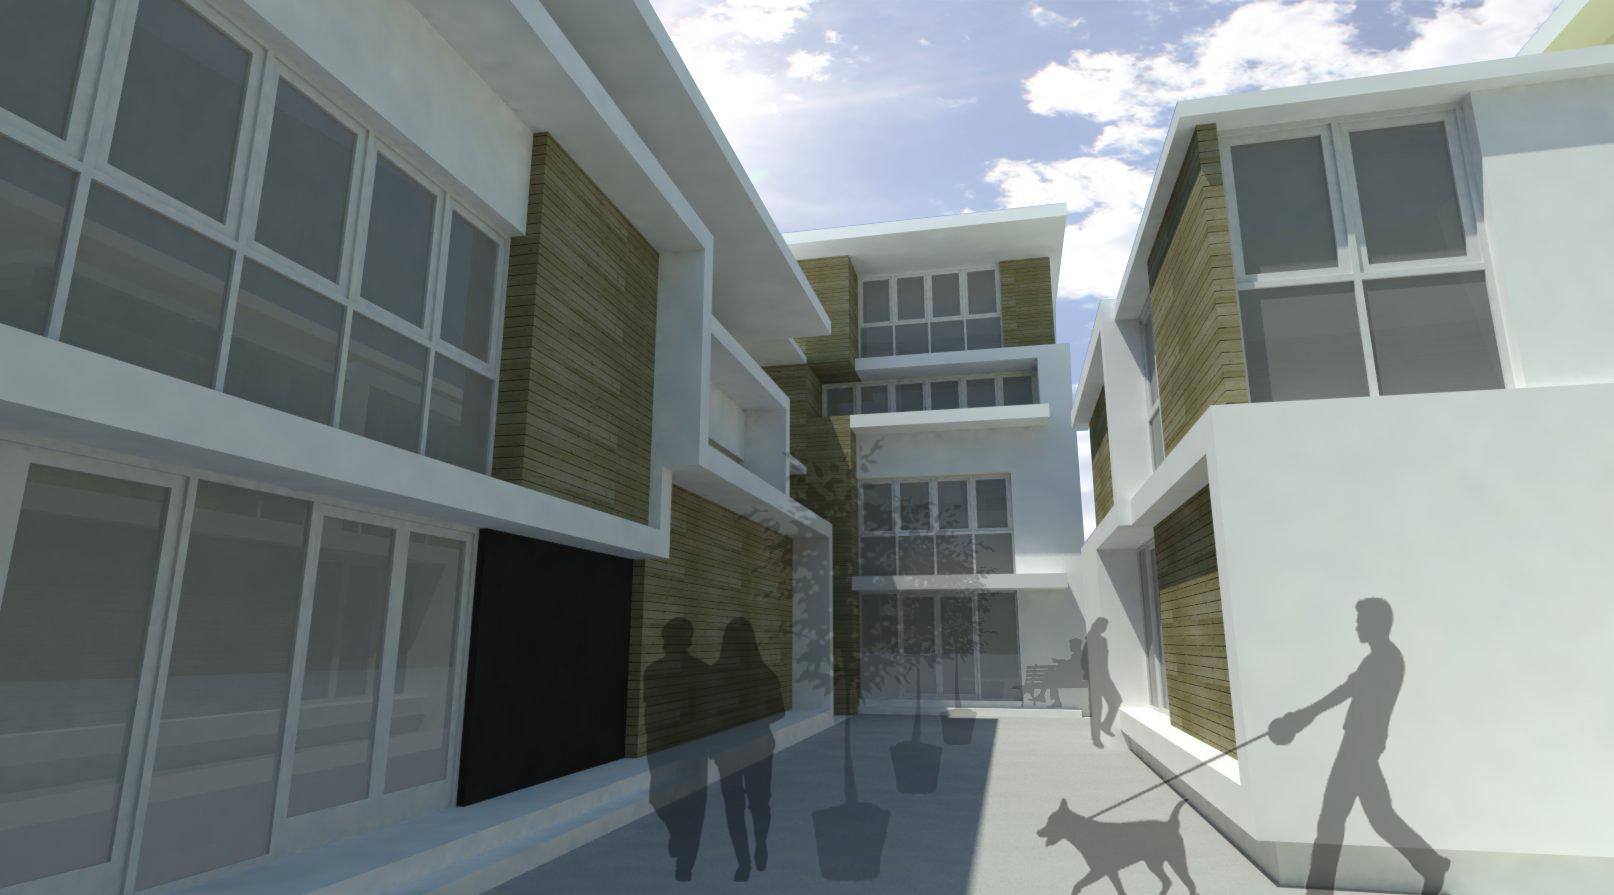 LA City College Student Housing